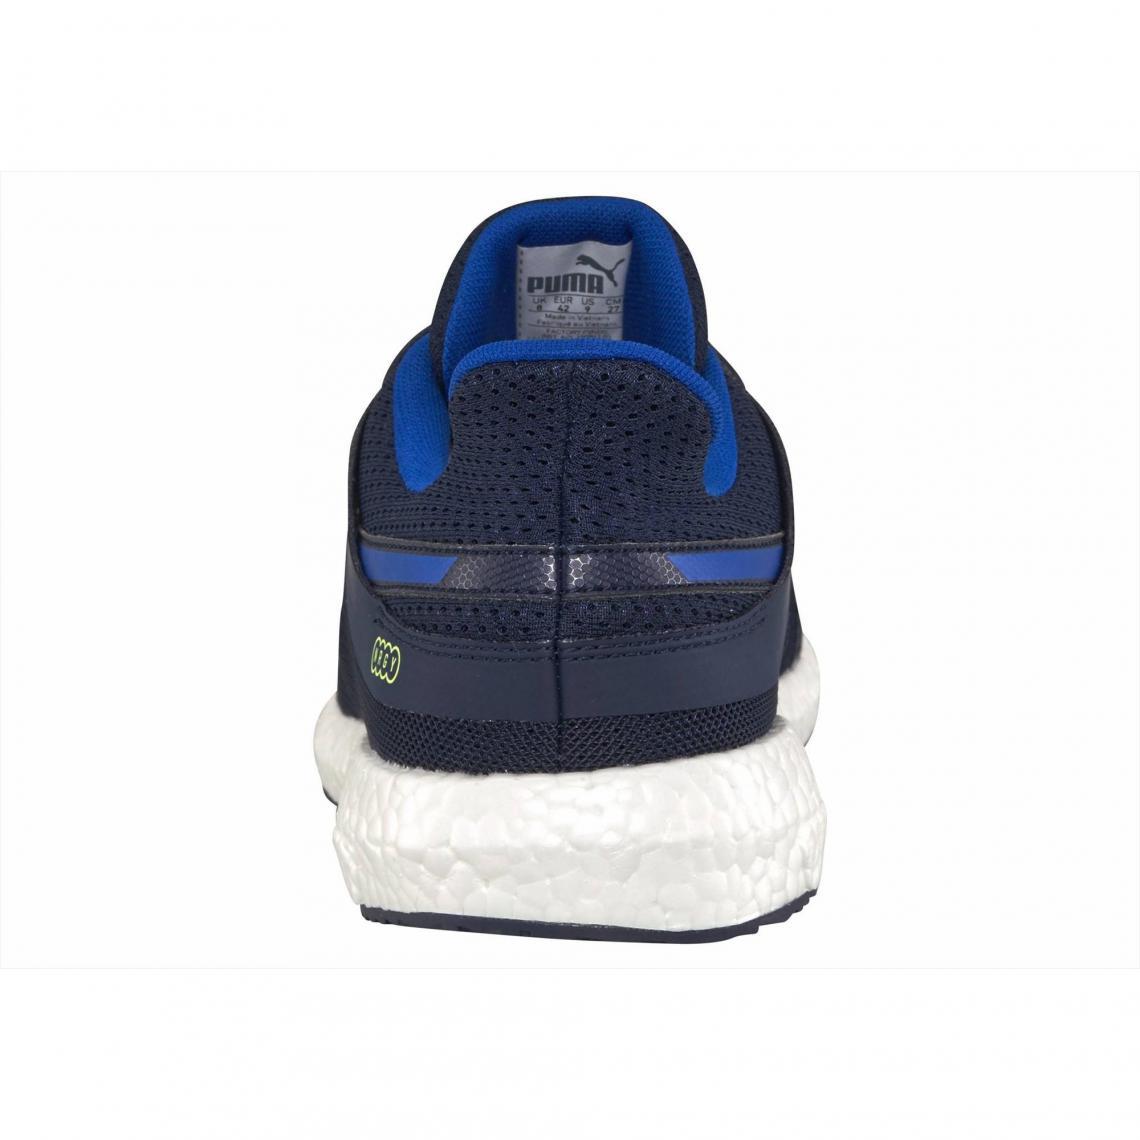 Turbo Chaussures Mega Bleu 3suisses 2 Nrgy Puma Homme De Sport Foncé fwgBxqgSYH